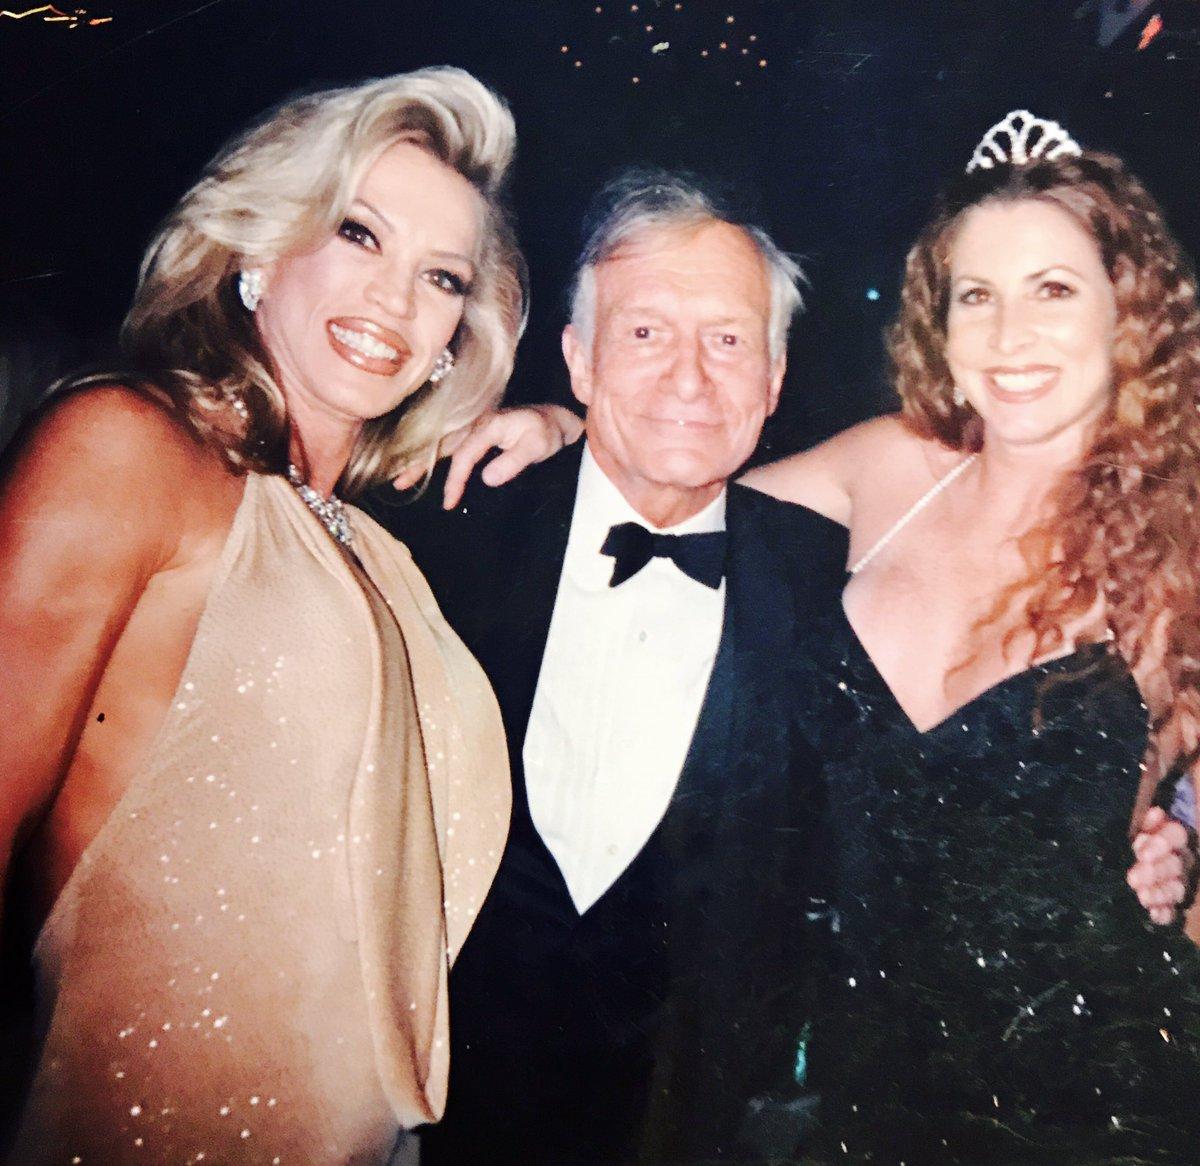 #RIPHef (myself with Hef, & Shanna) many memories of your Wonderful legacy, my heartfelt condolences